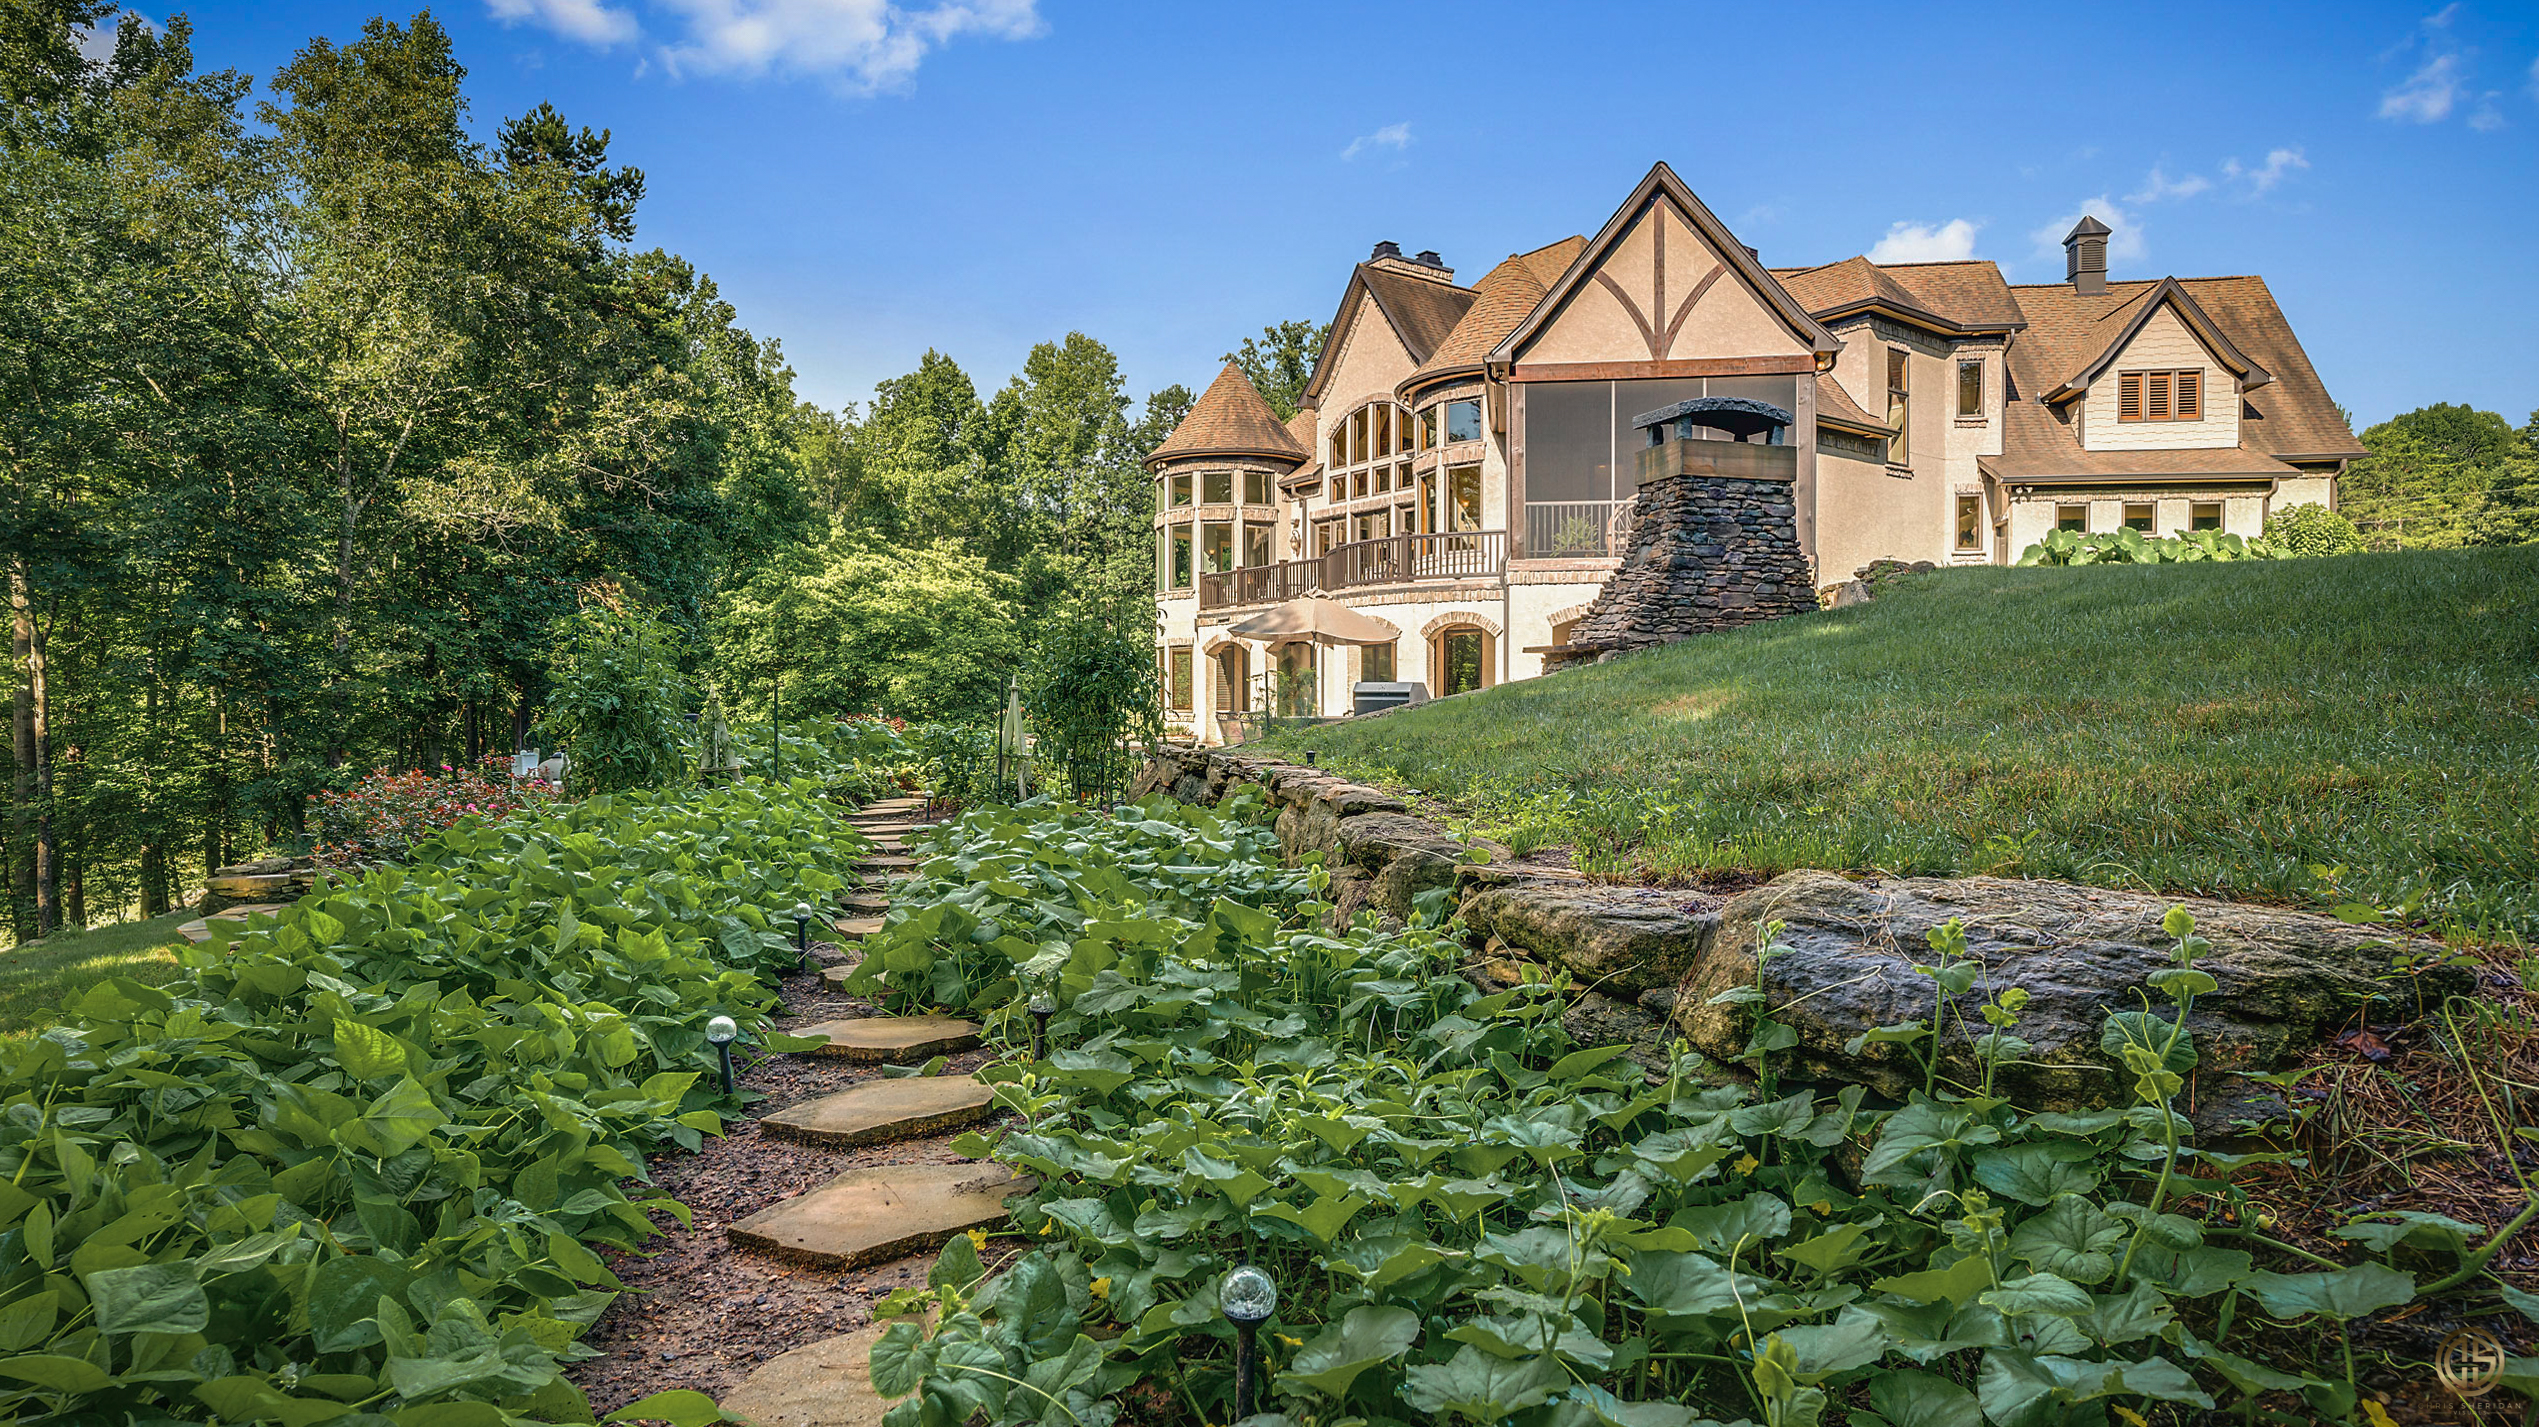 Elegant exterior real estate image